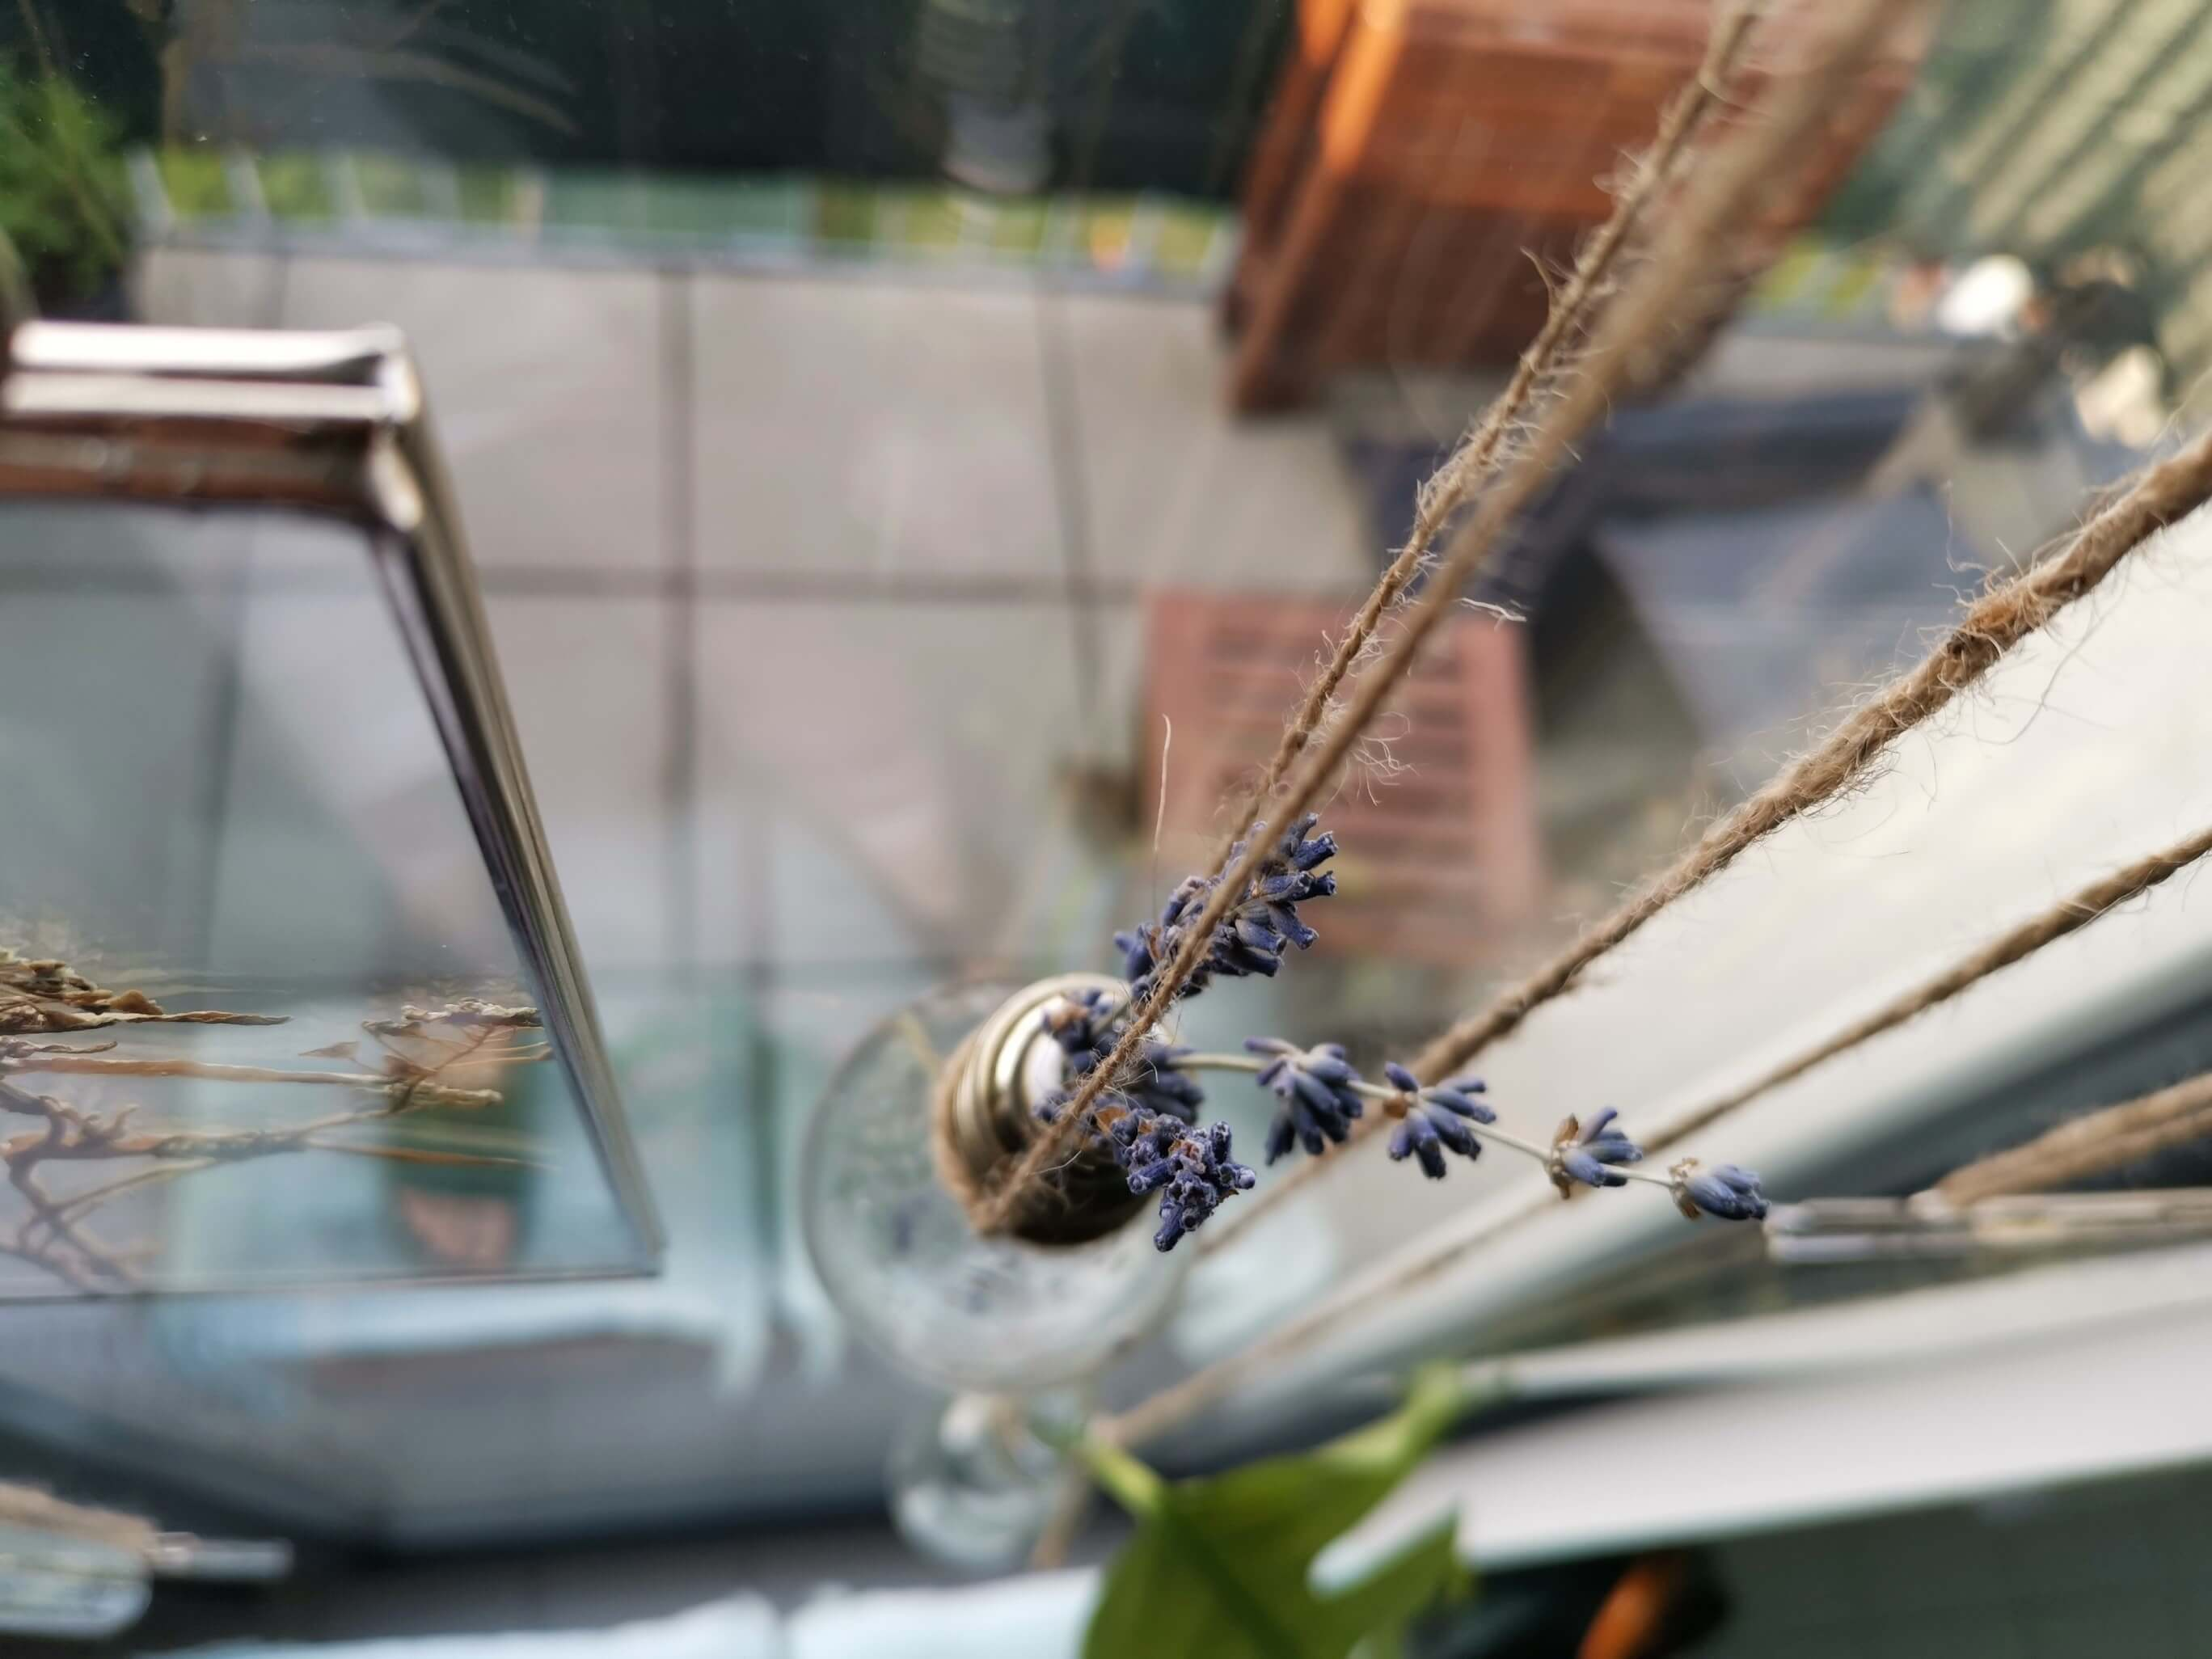 IMG 20190501 185656 resized 20190501 070441454 - Botanische Fensterdekoration: Herbarium statt Gardinen